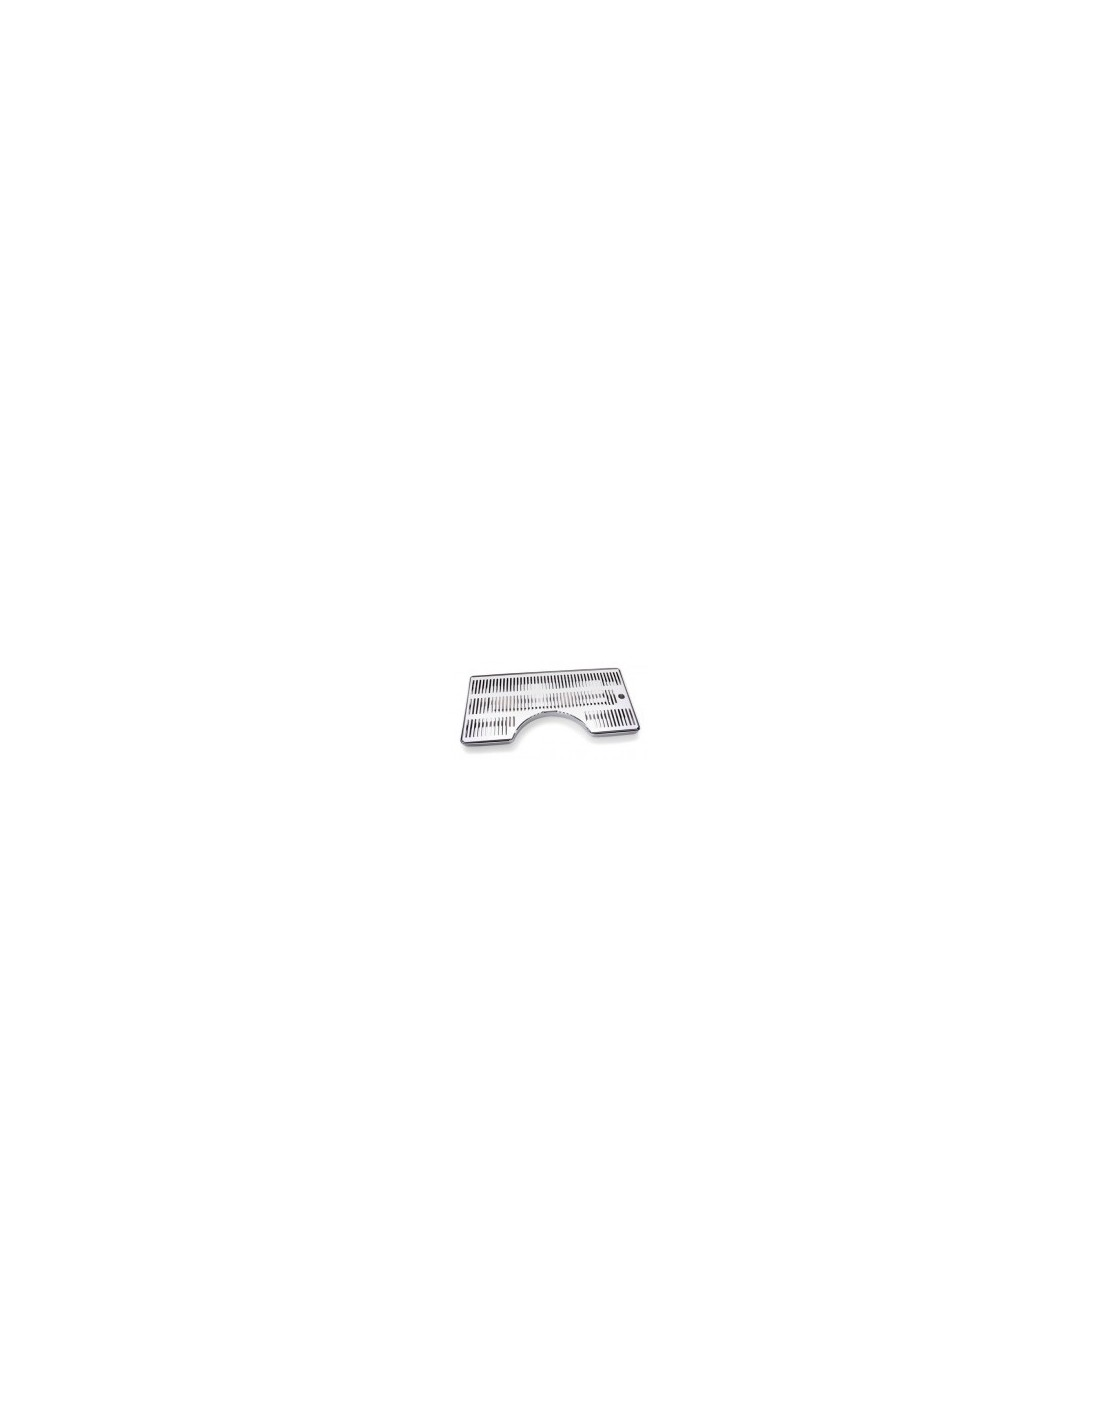 ODM01006 - Spillbricka i rostfritt 500x250 mm D170